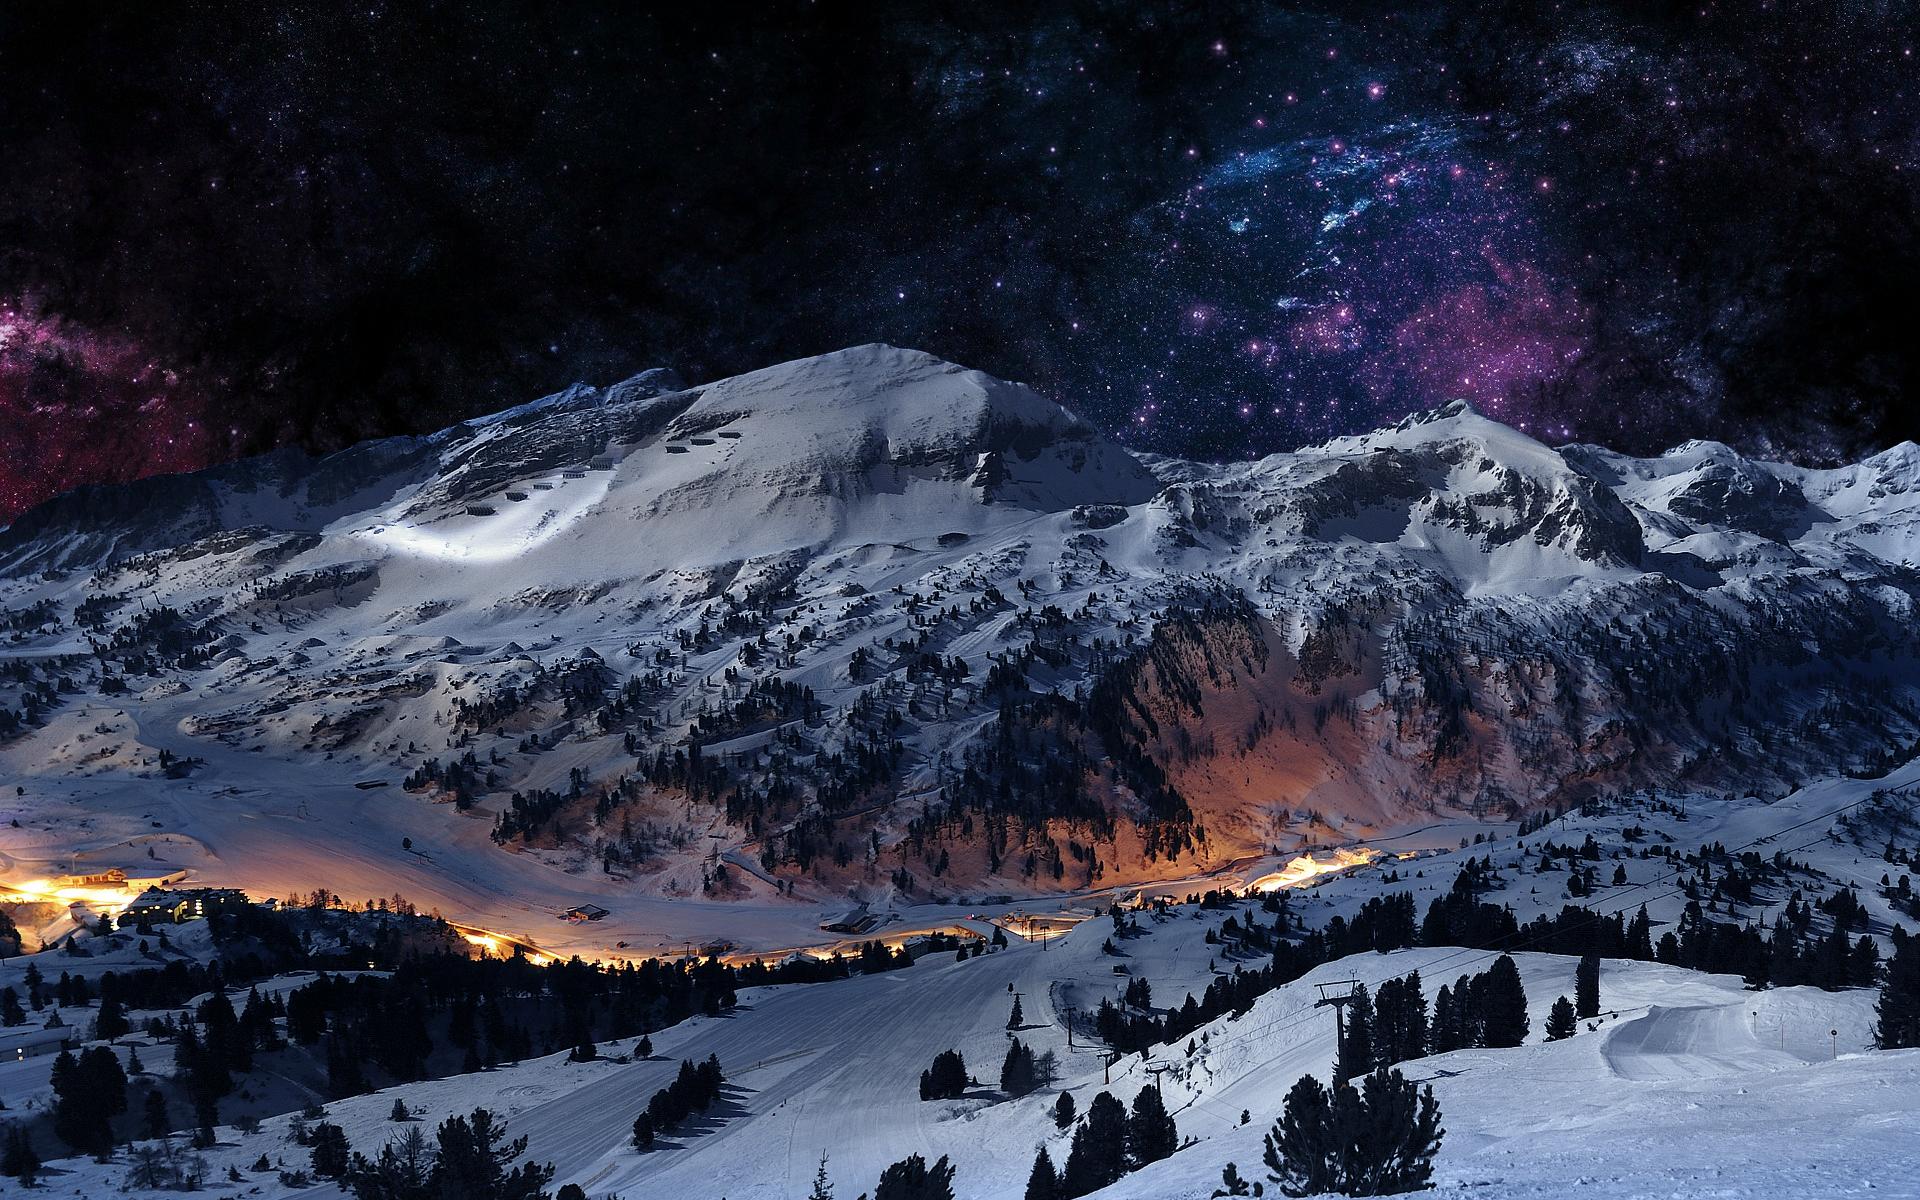 galleries related winter wallpaper winter ski mountains wallpaper 1920x1200